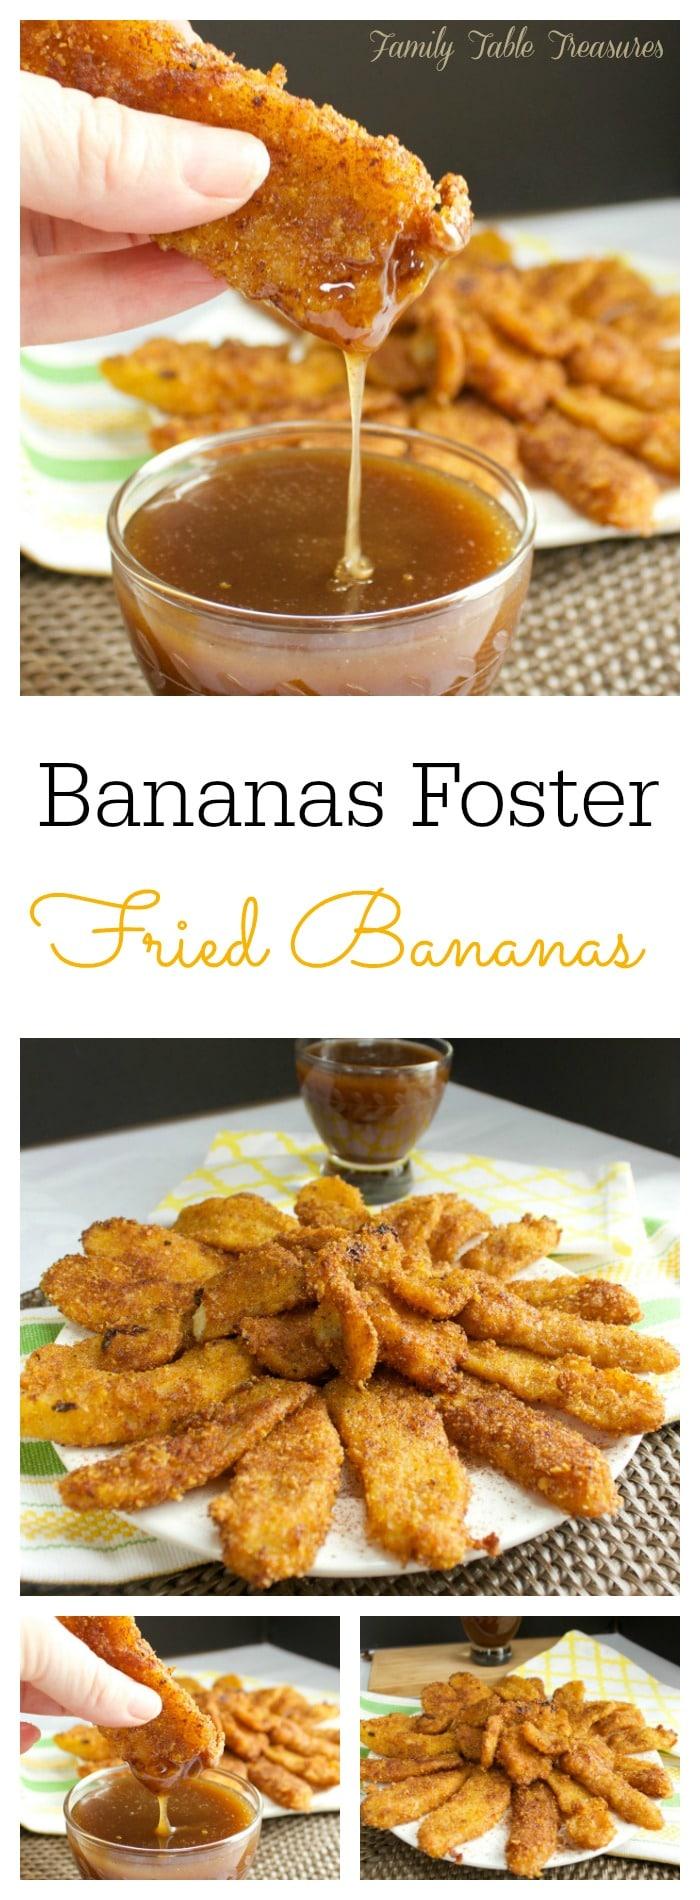 {Bananas Foster} Fried Bananas